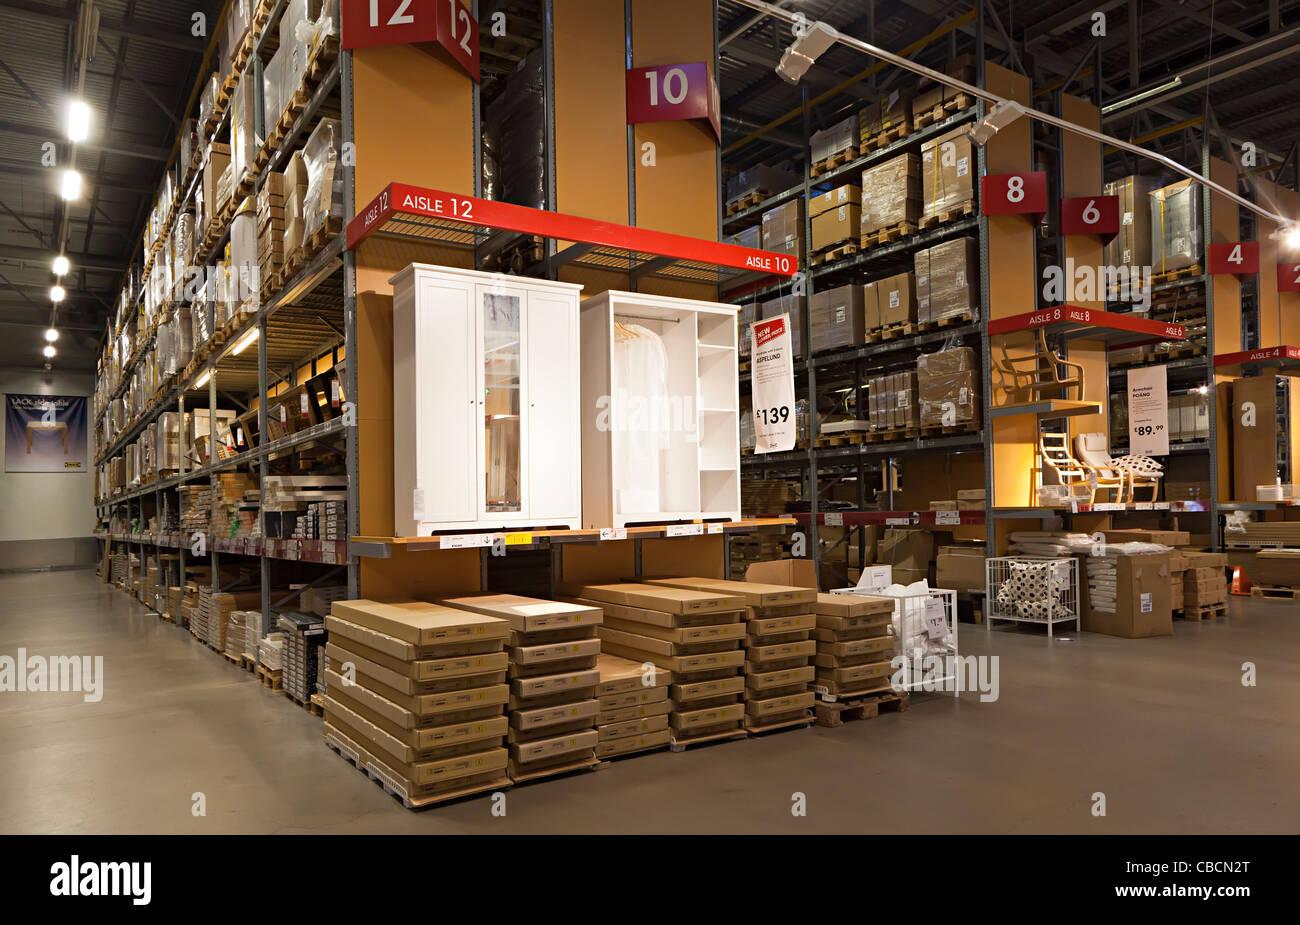 Ikea stock on shelves UK - Stock Image